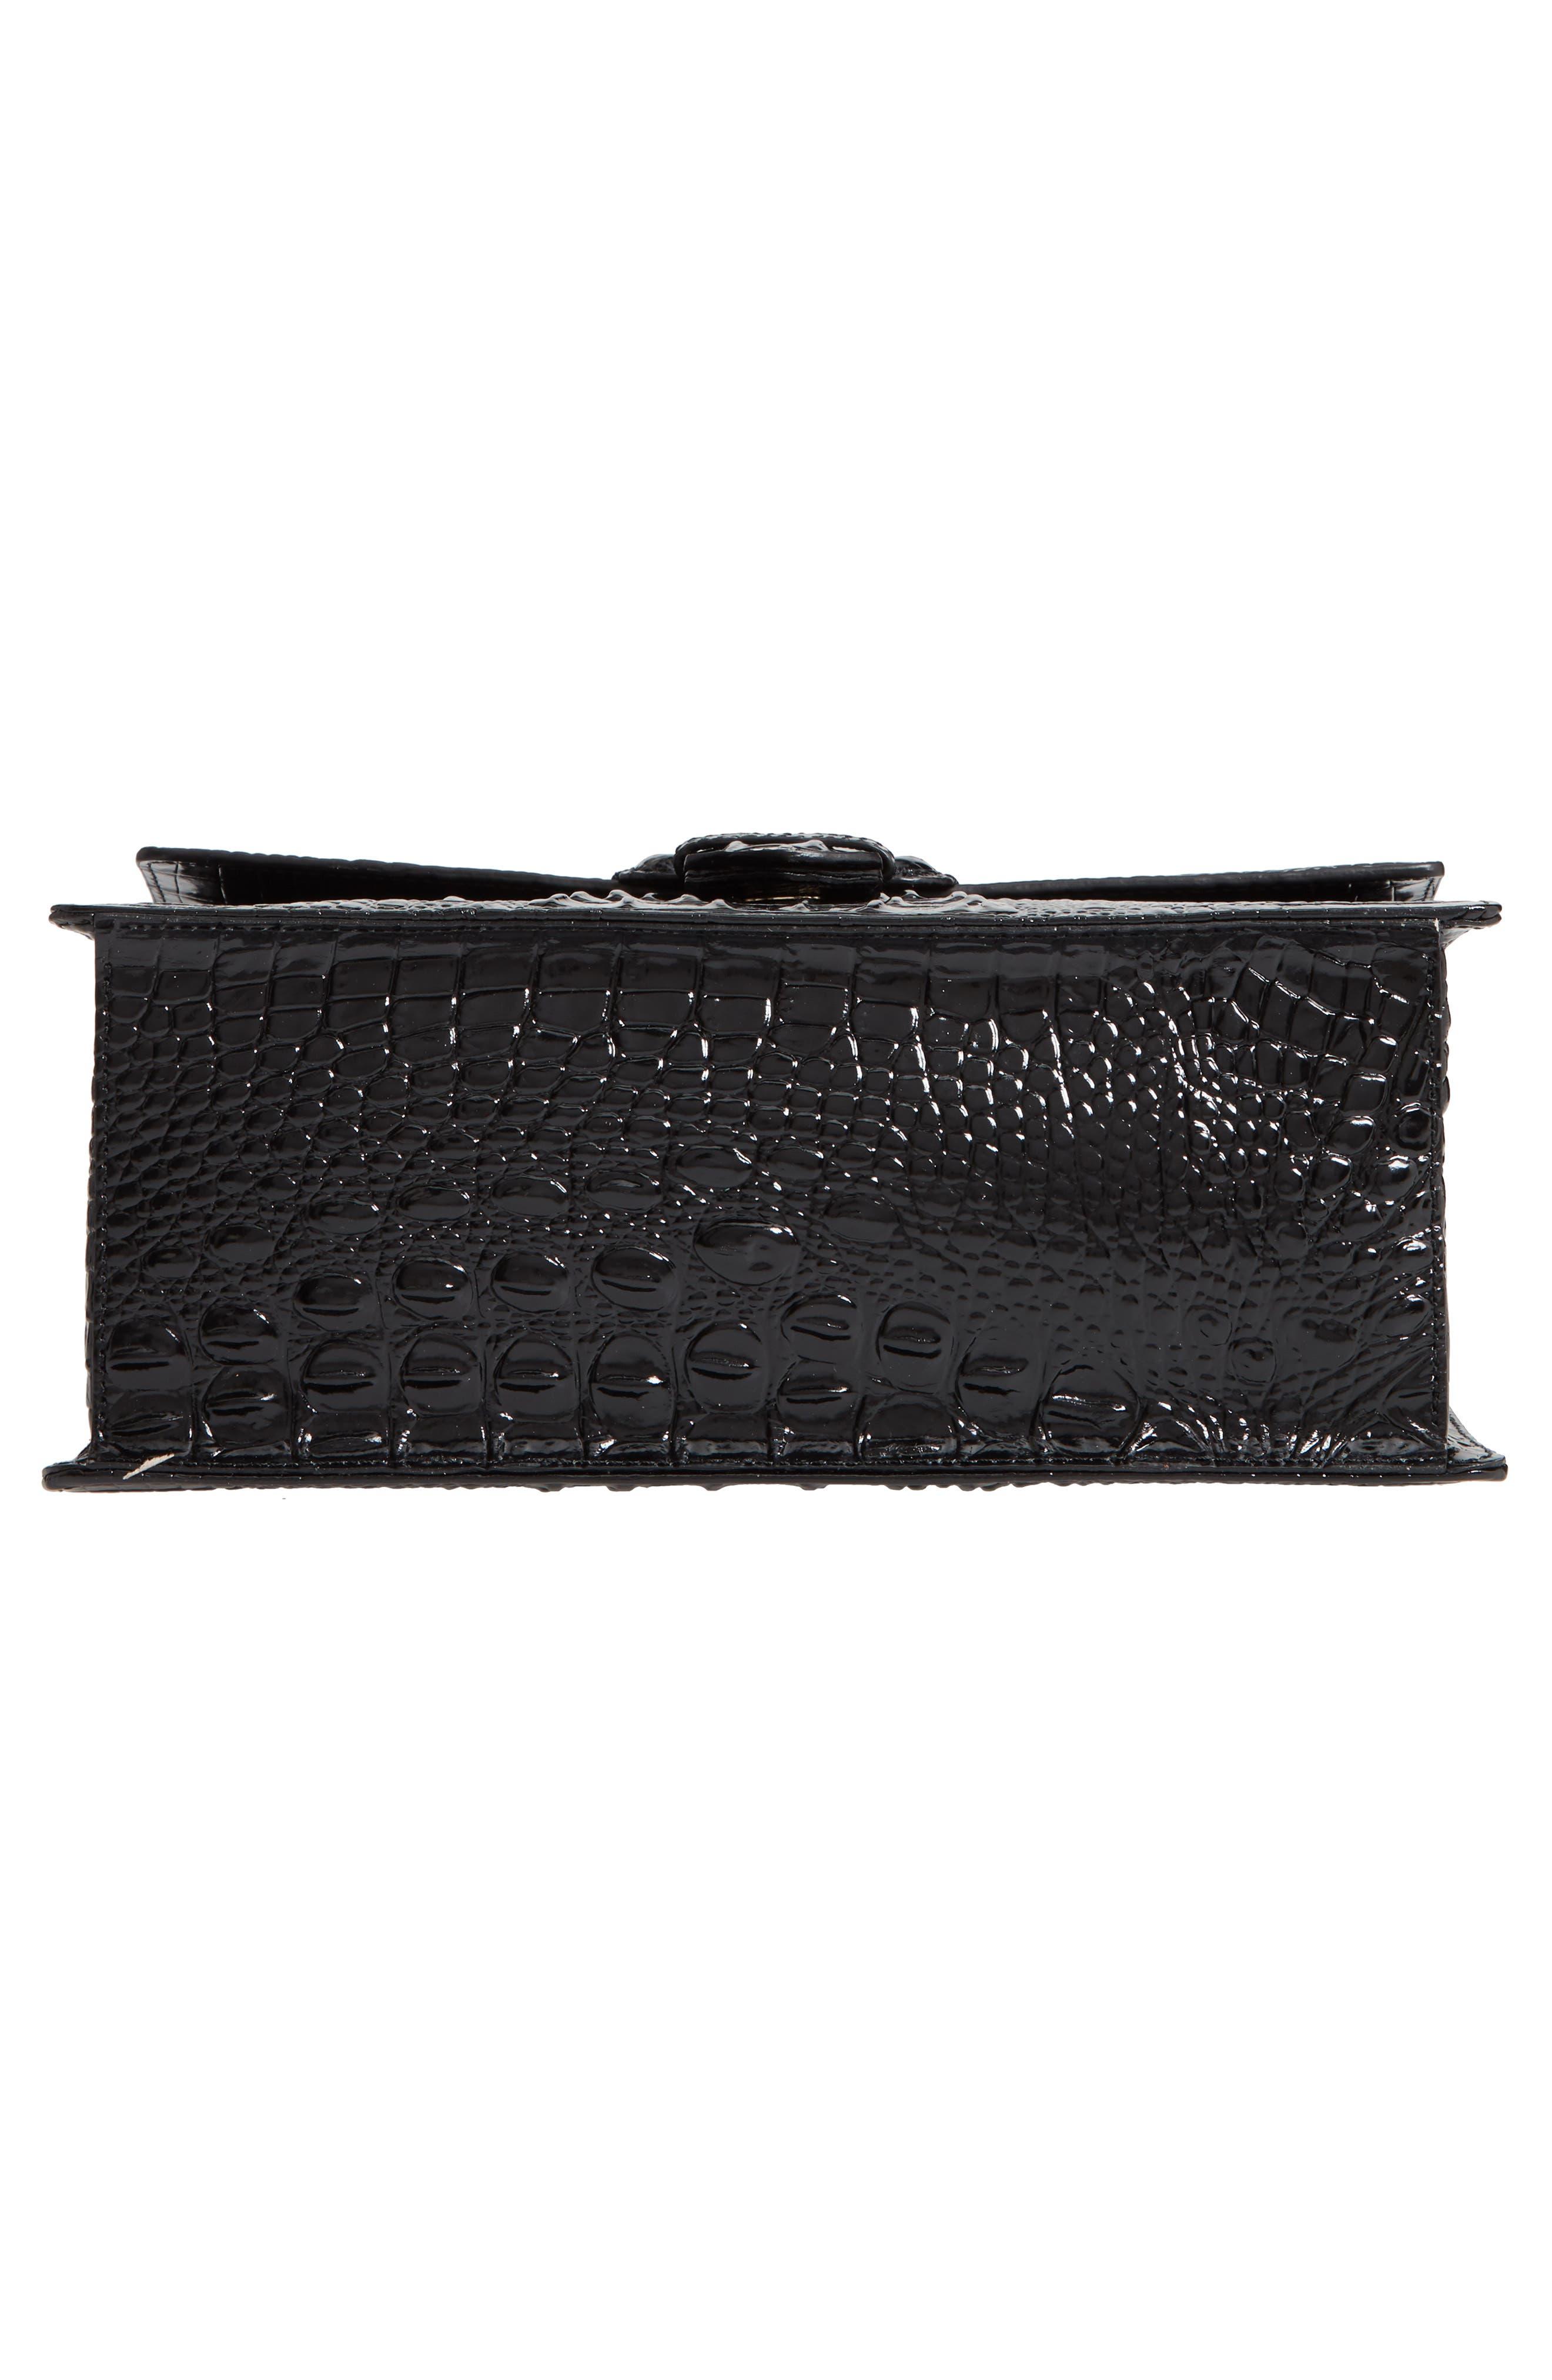 BRAHMIN, Medium Francine Croc Embossed Leather Satchel, Alternate thumbnail 6, color, 001